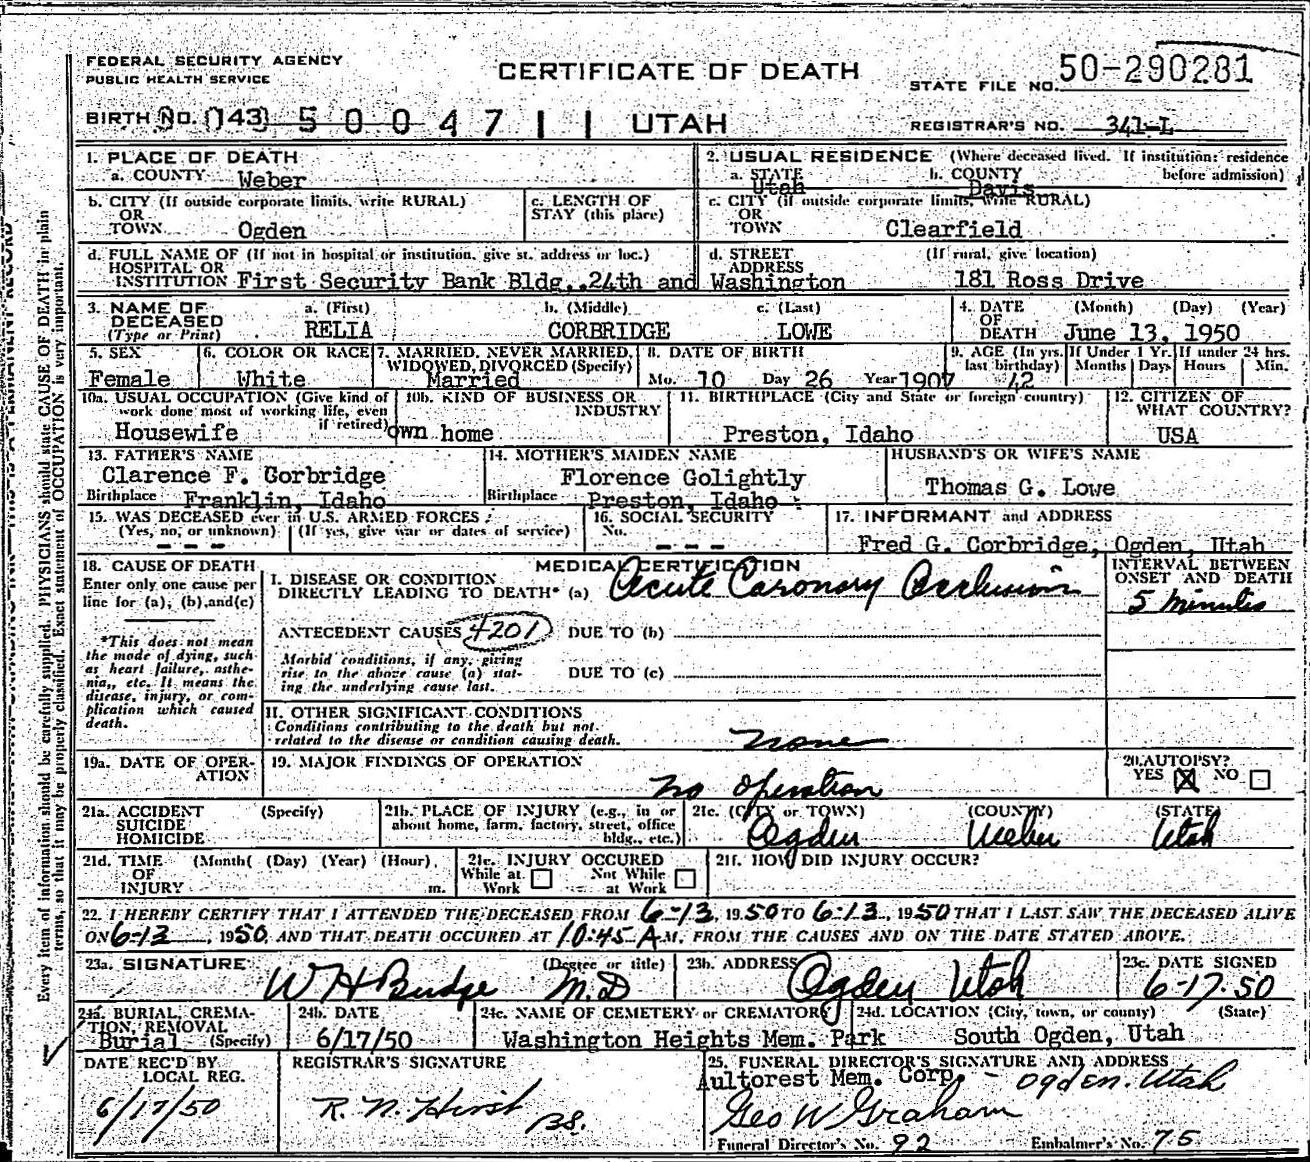 Death records death certificate relia corbridge lowe 1950 xflitez Choice Image